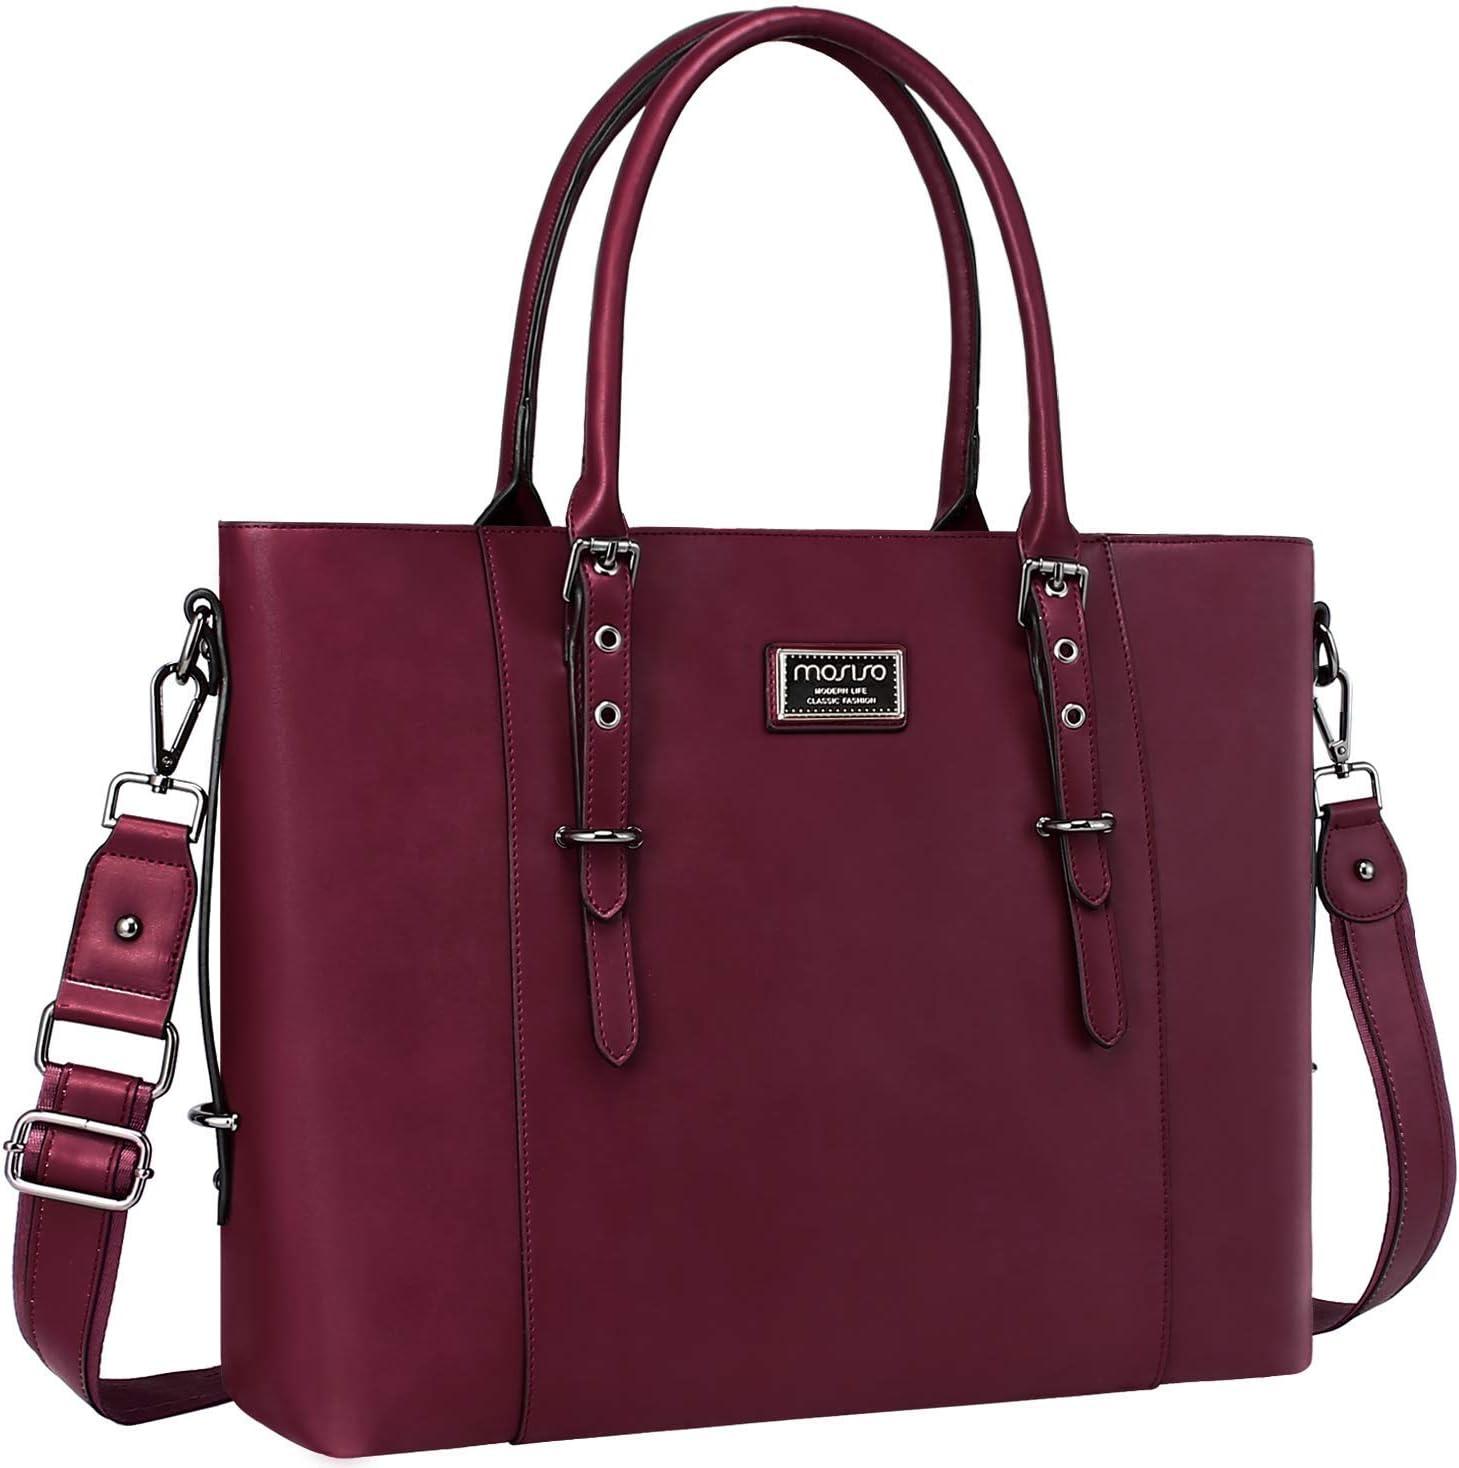 Laptop Bag for Women,15.6 Inch Multi Pocket Padded Laptop Tote Bag,Padlock De...